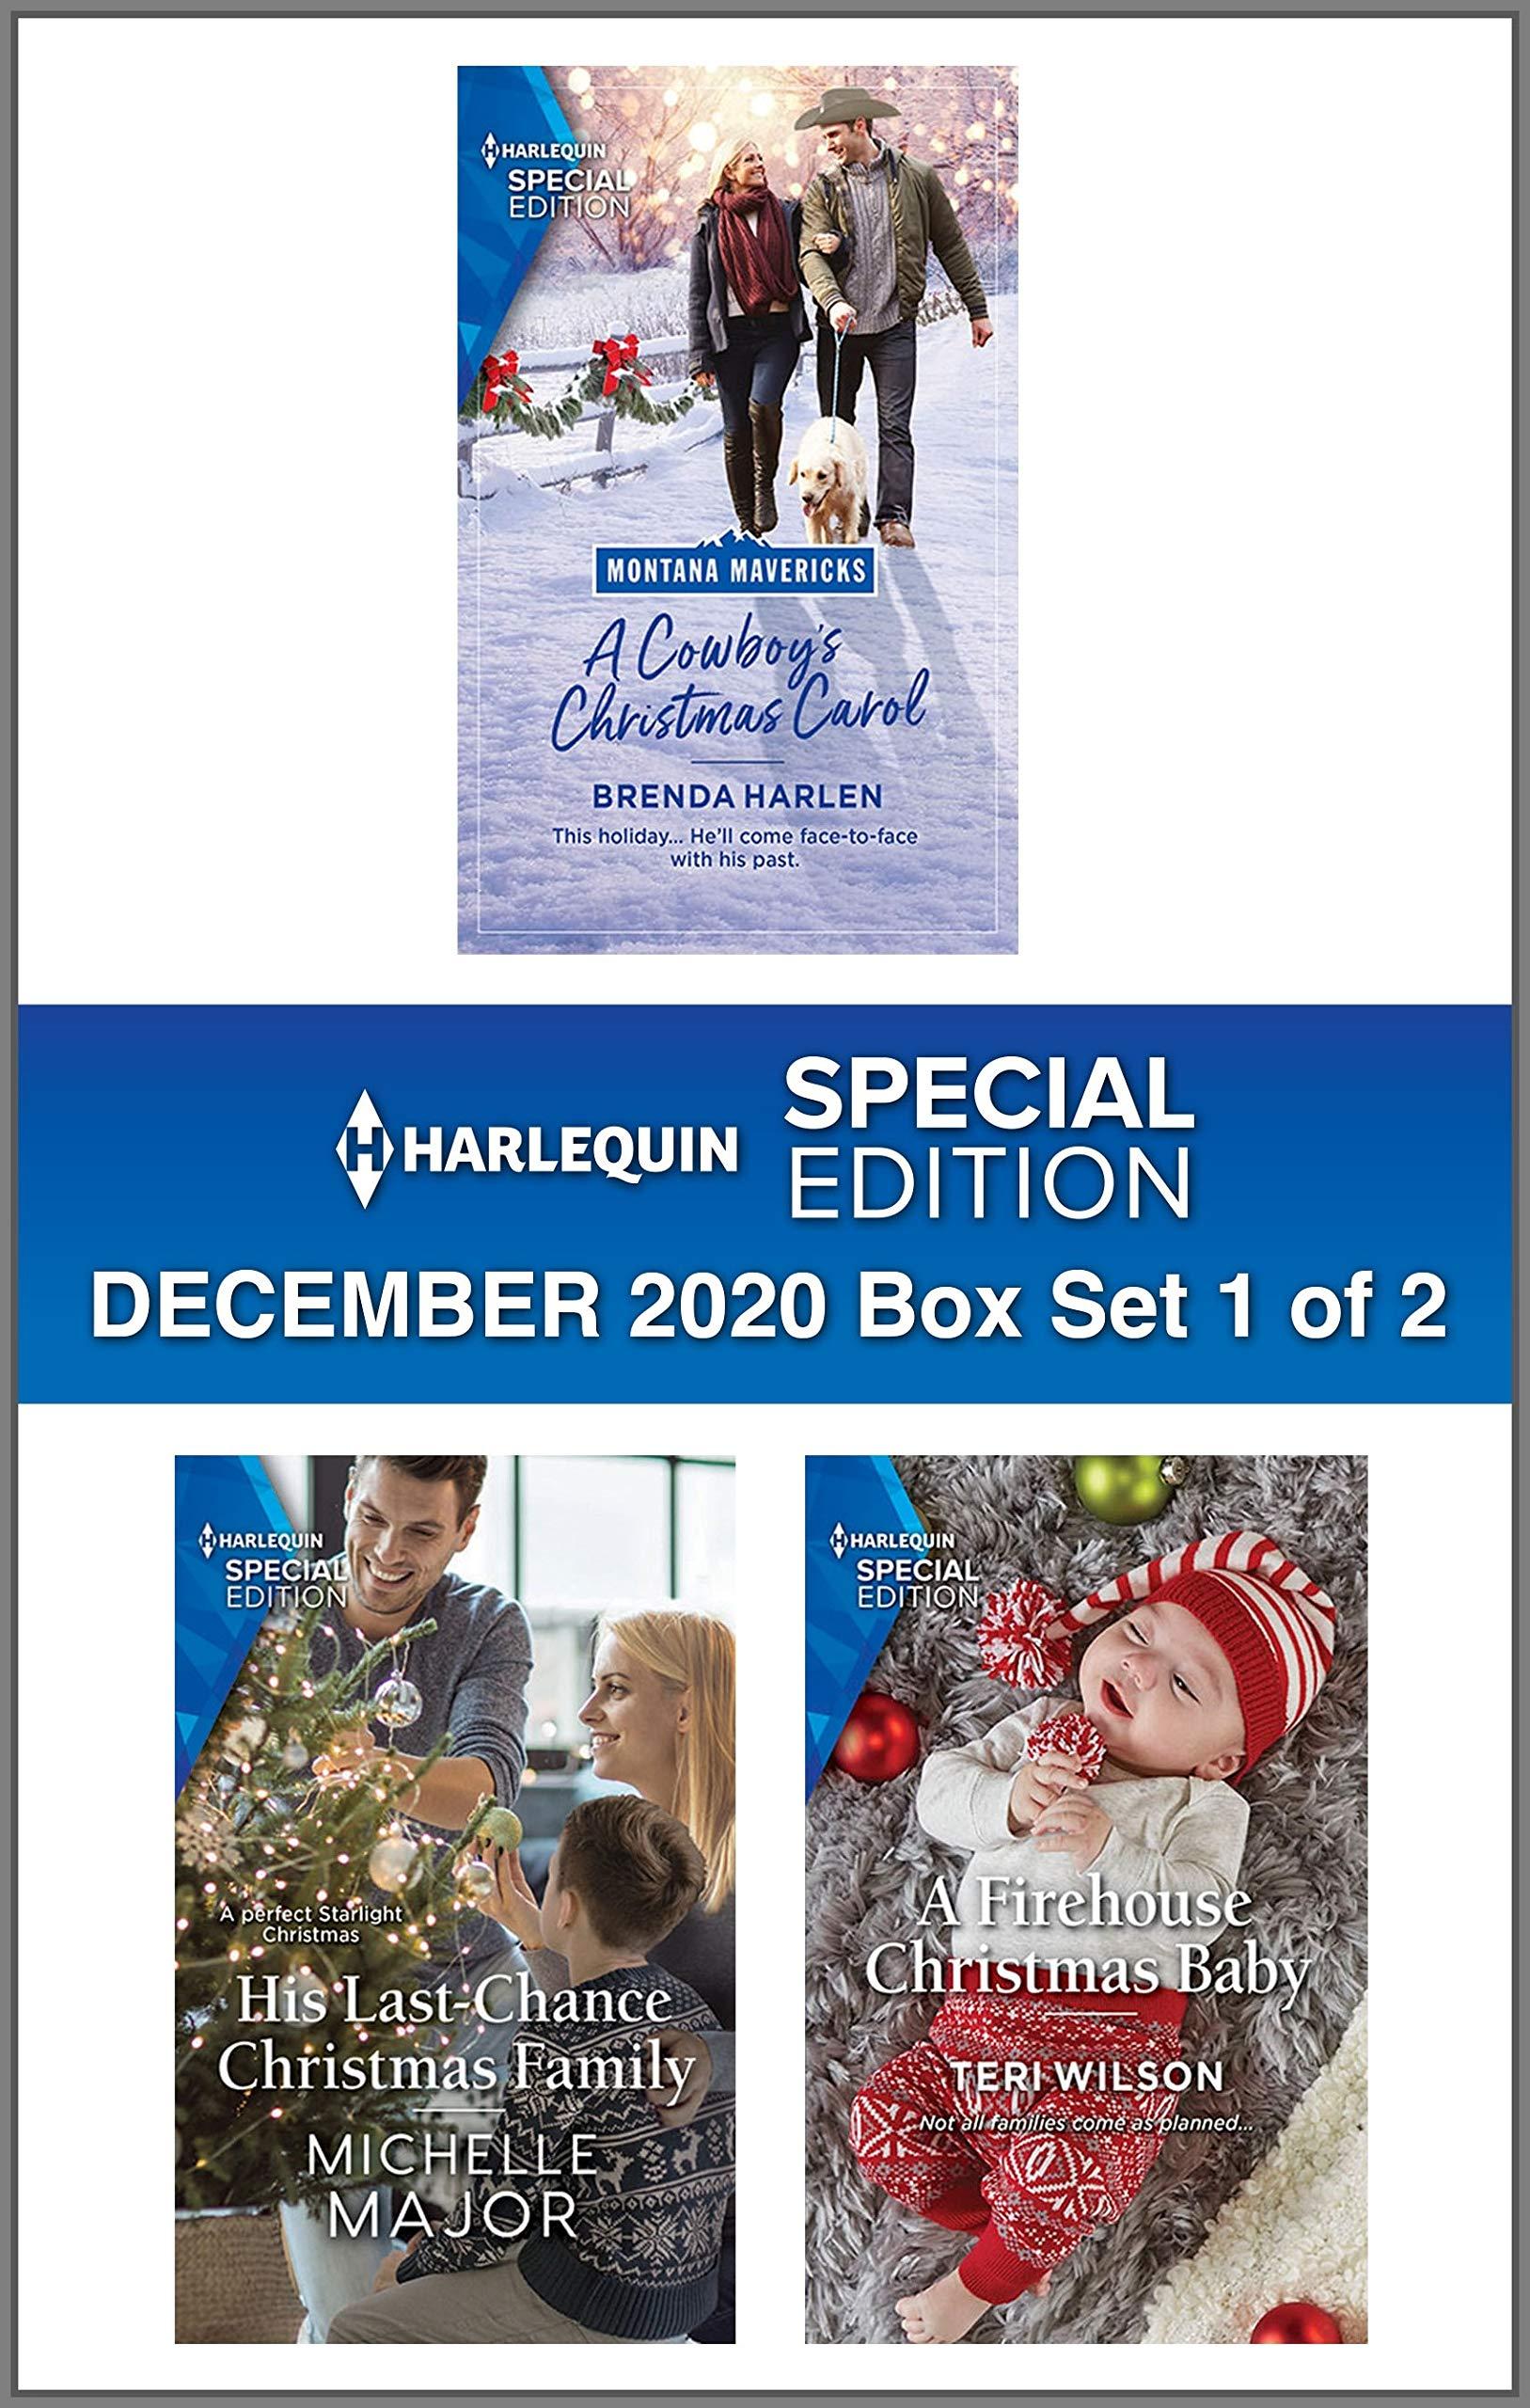 Harlequin Special Edition December 2020 - Box Set 1 of 2